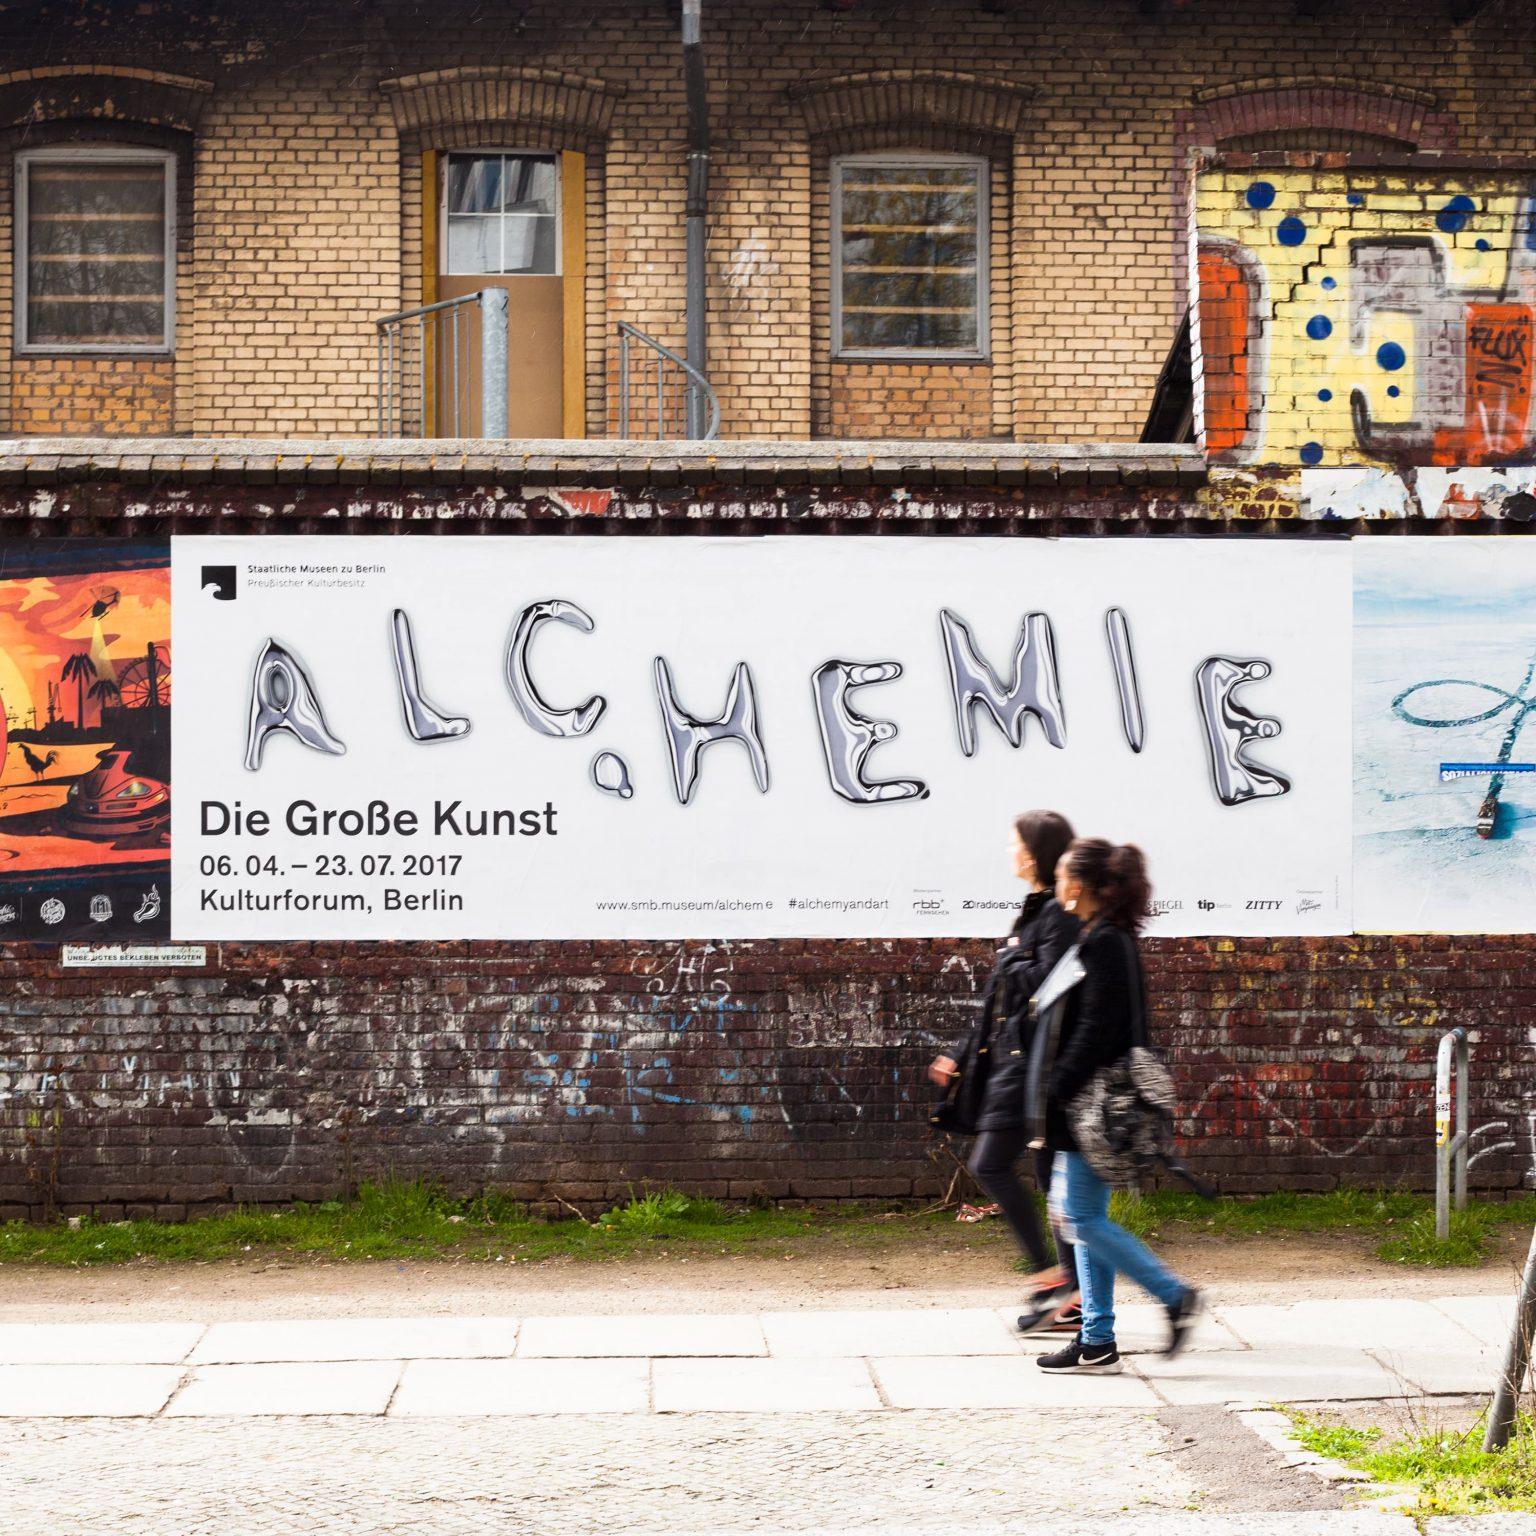 Ta Trung Alchemie 21